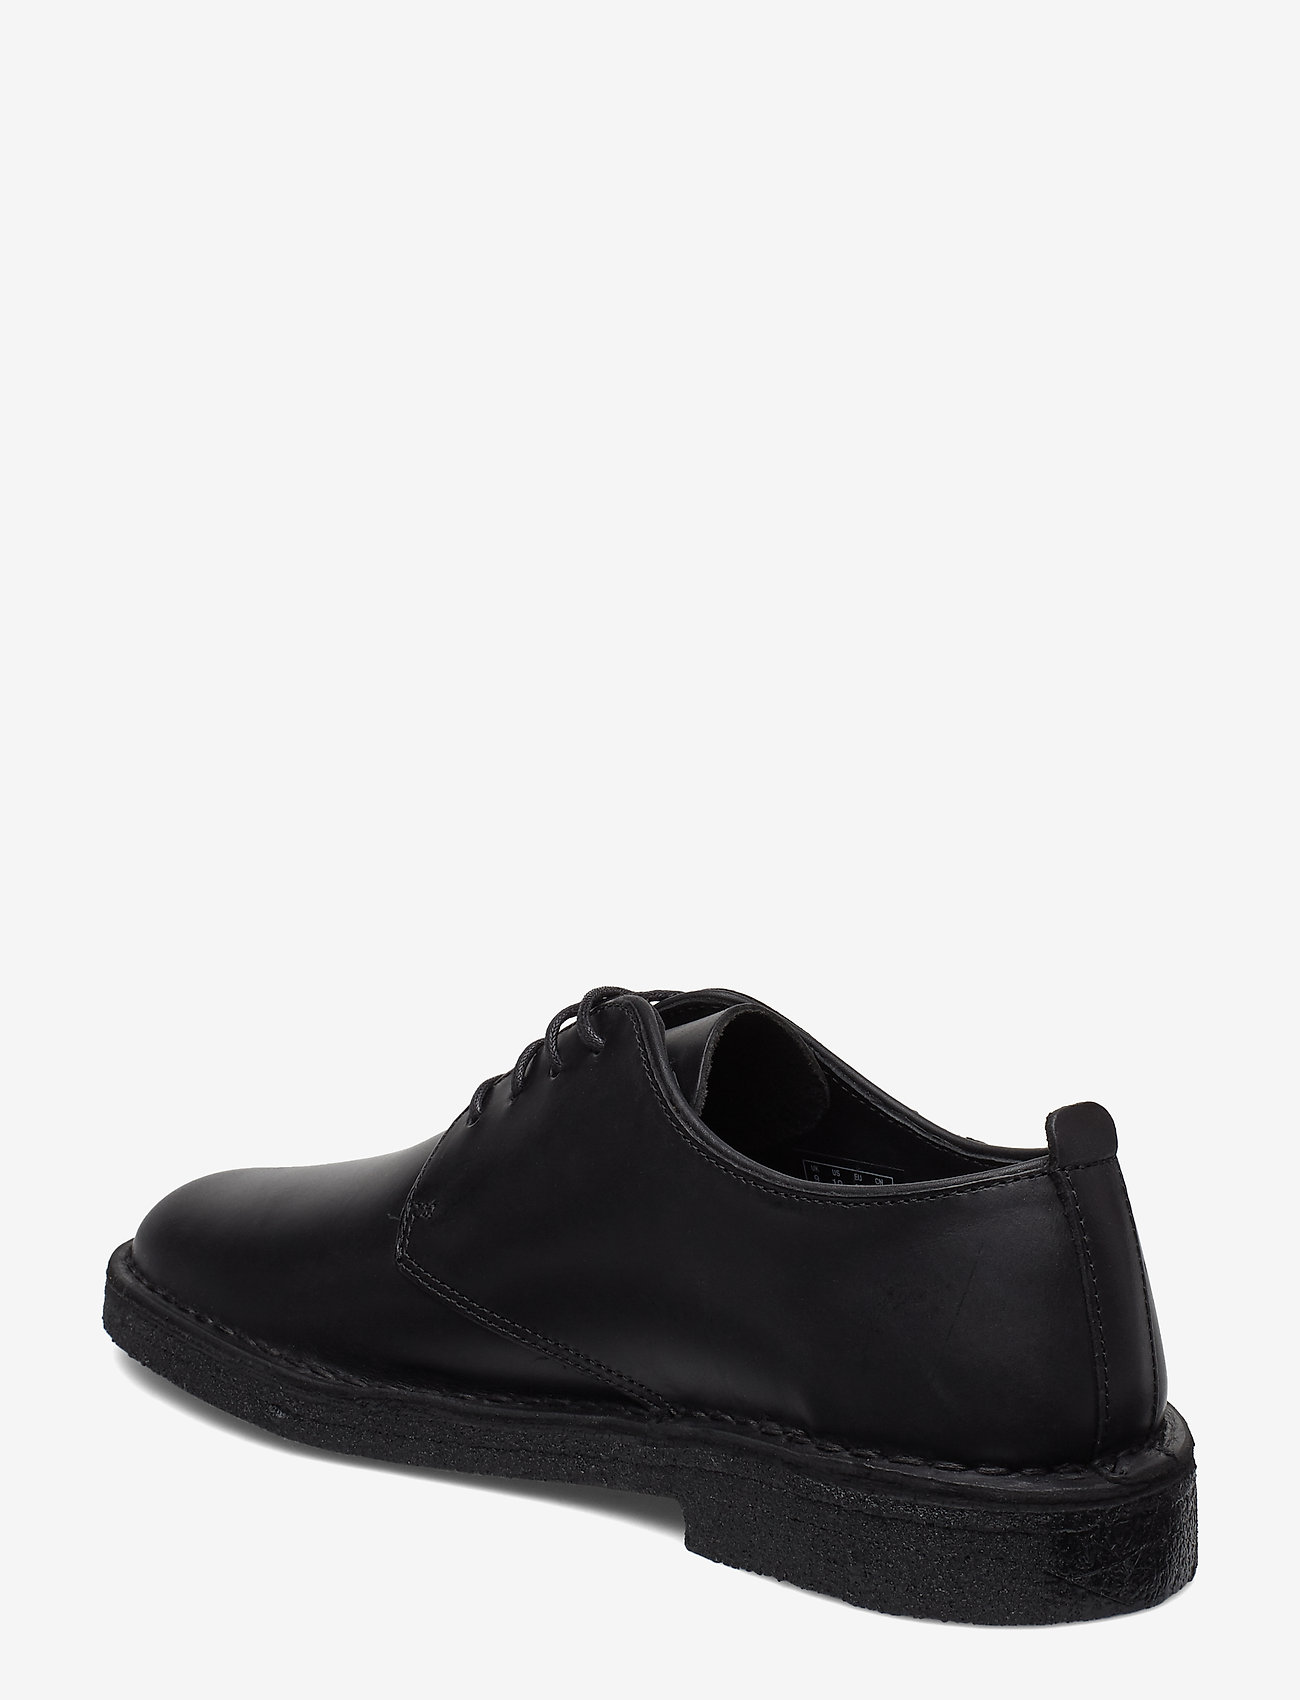 Clarks Originals - Desert London - snörskor - black leather - 2